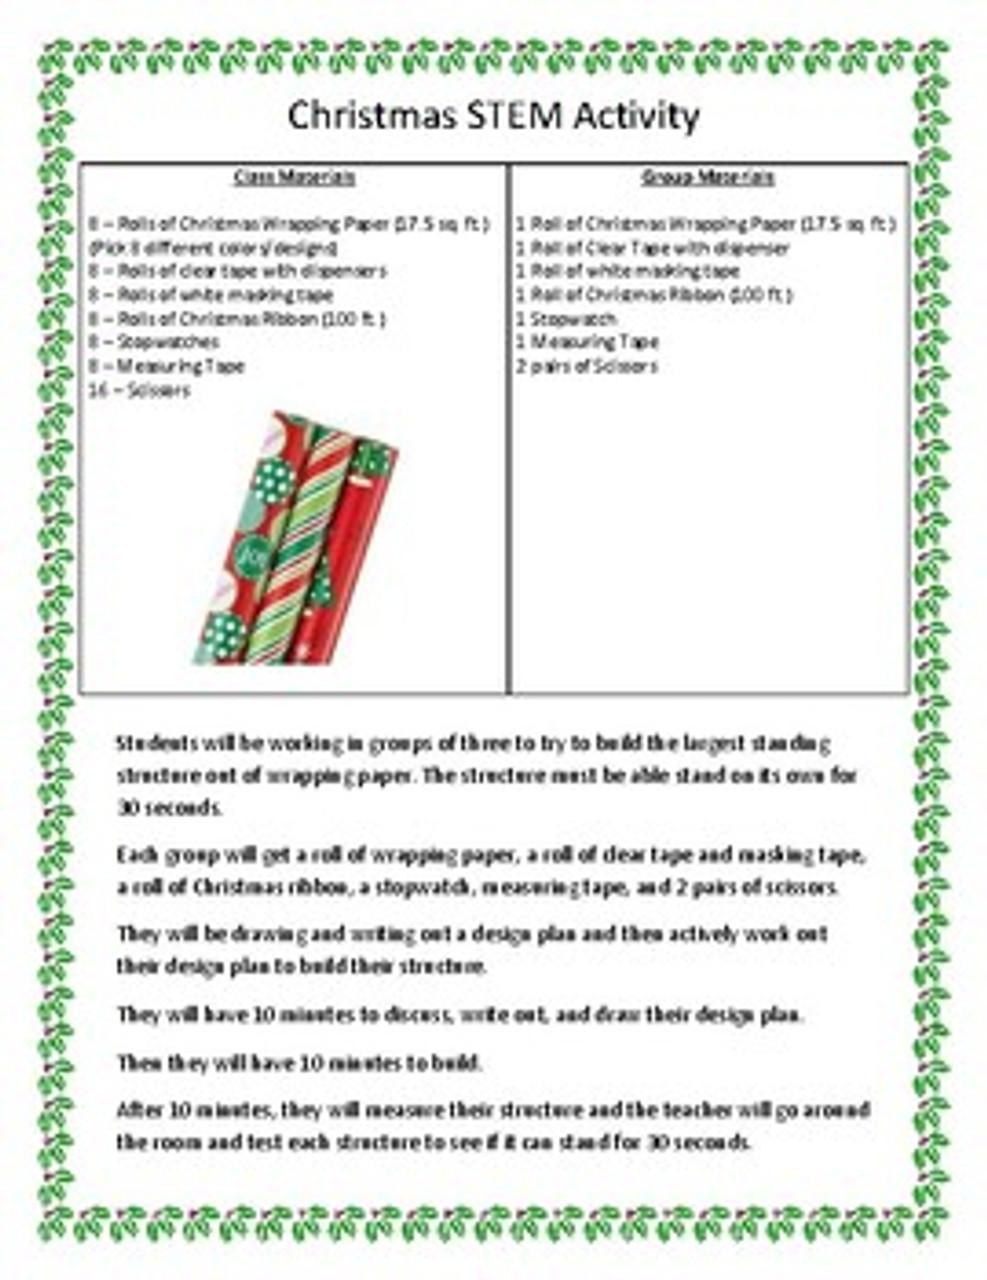 Christmas STEM Activity